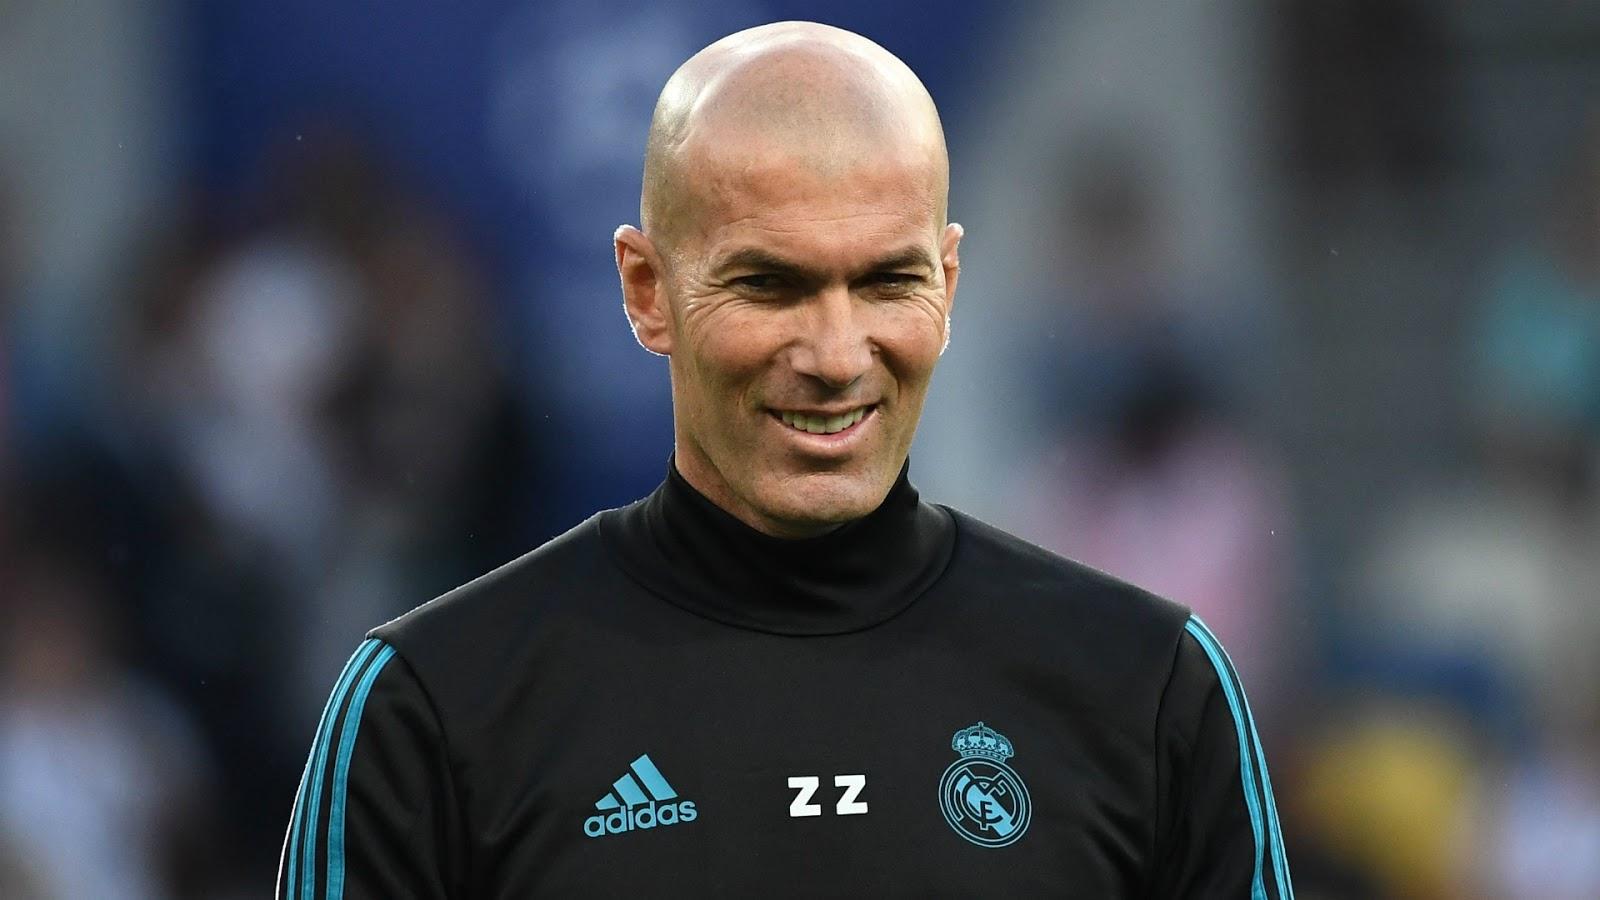 Kembali Latih Real Madrid, Ini 4 Pemain Baru Incaran Zinedine Zidane